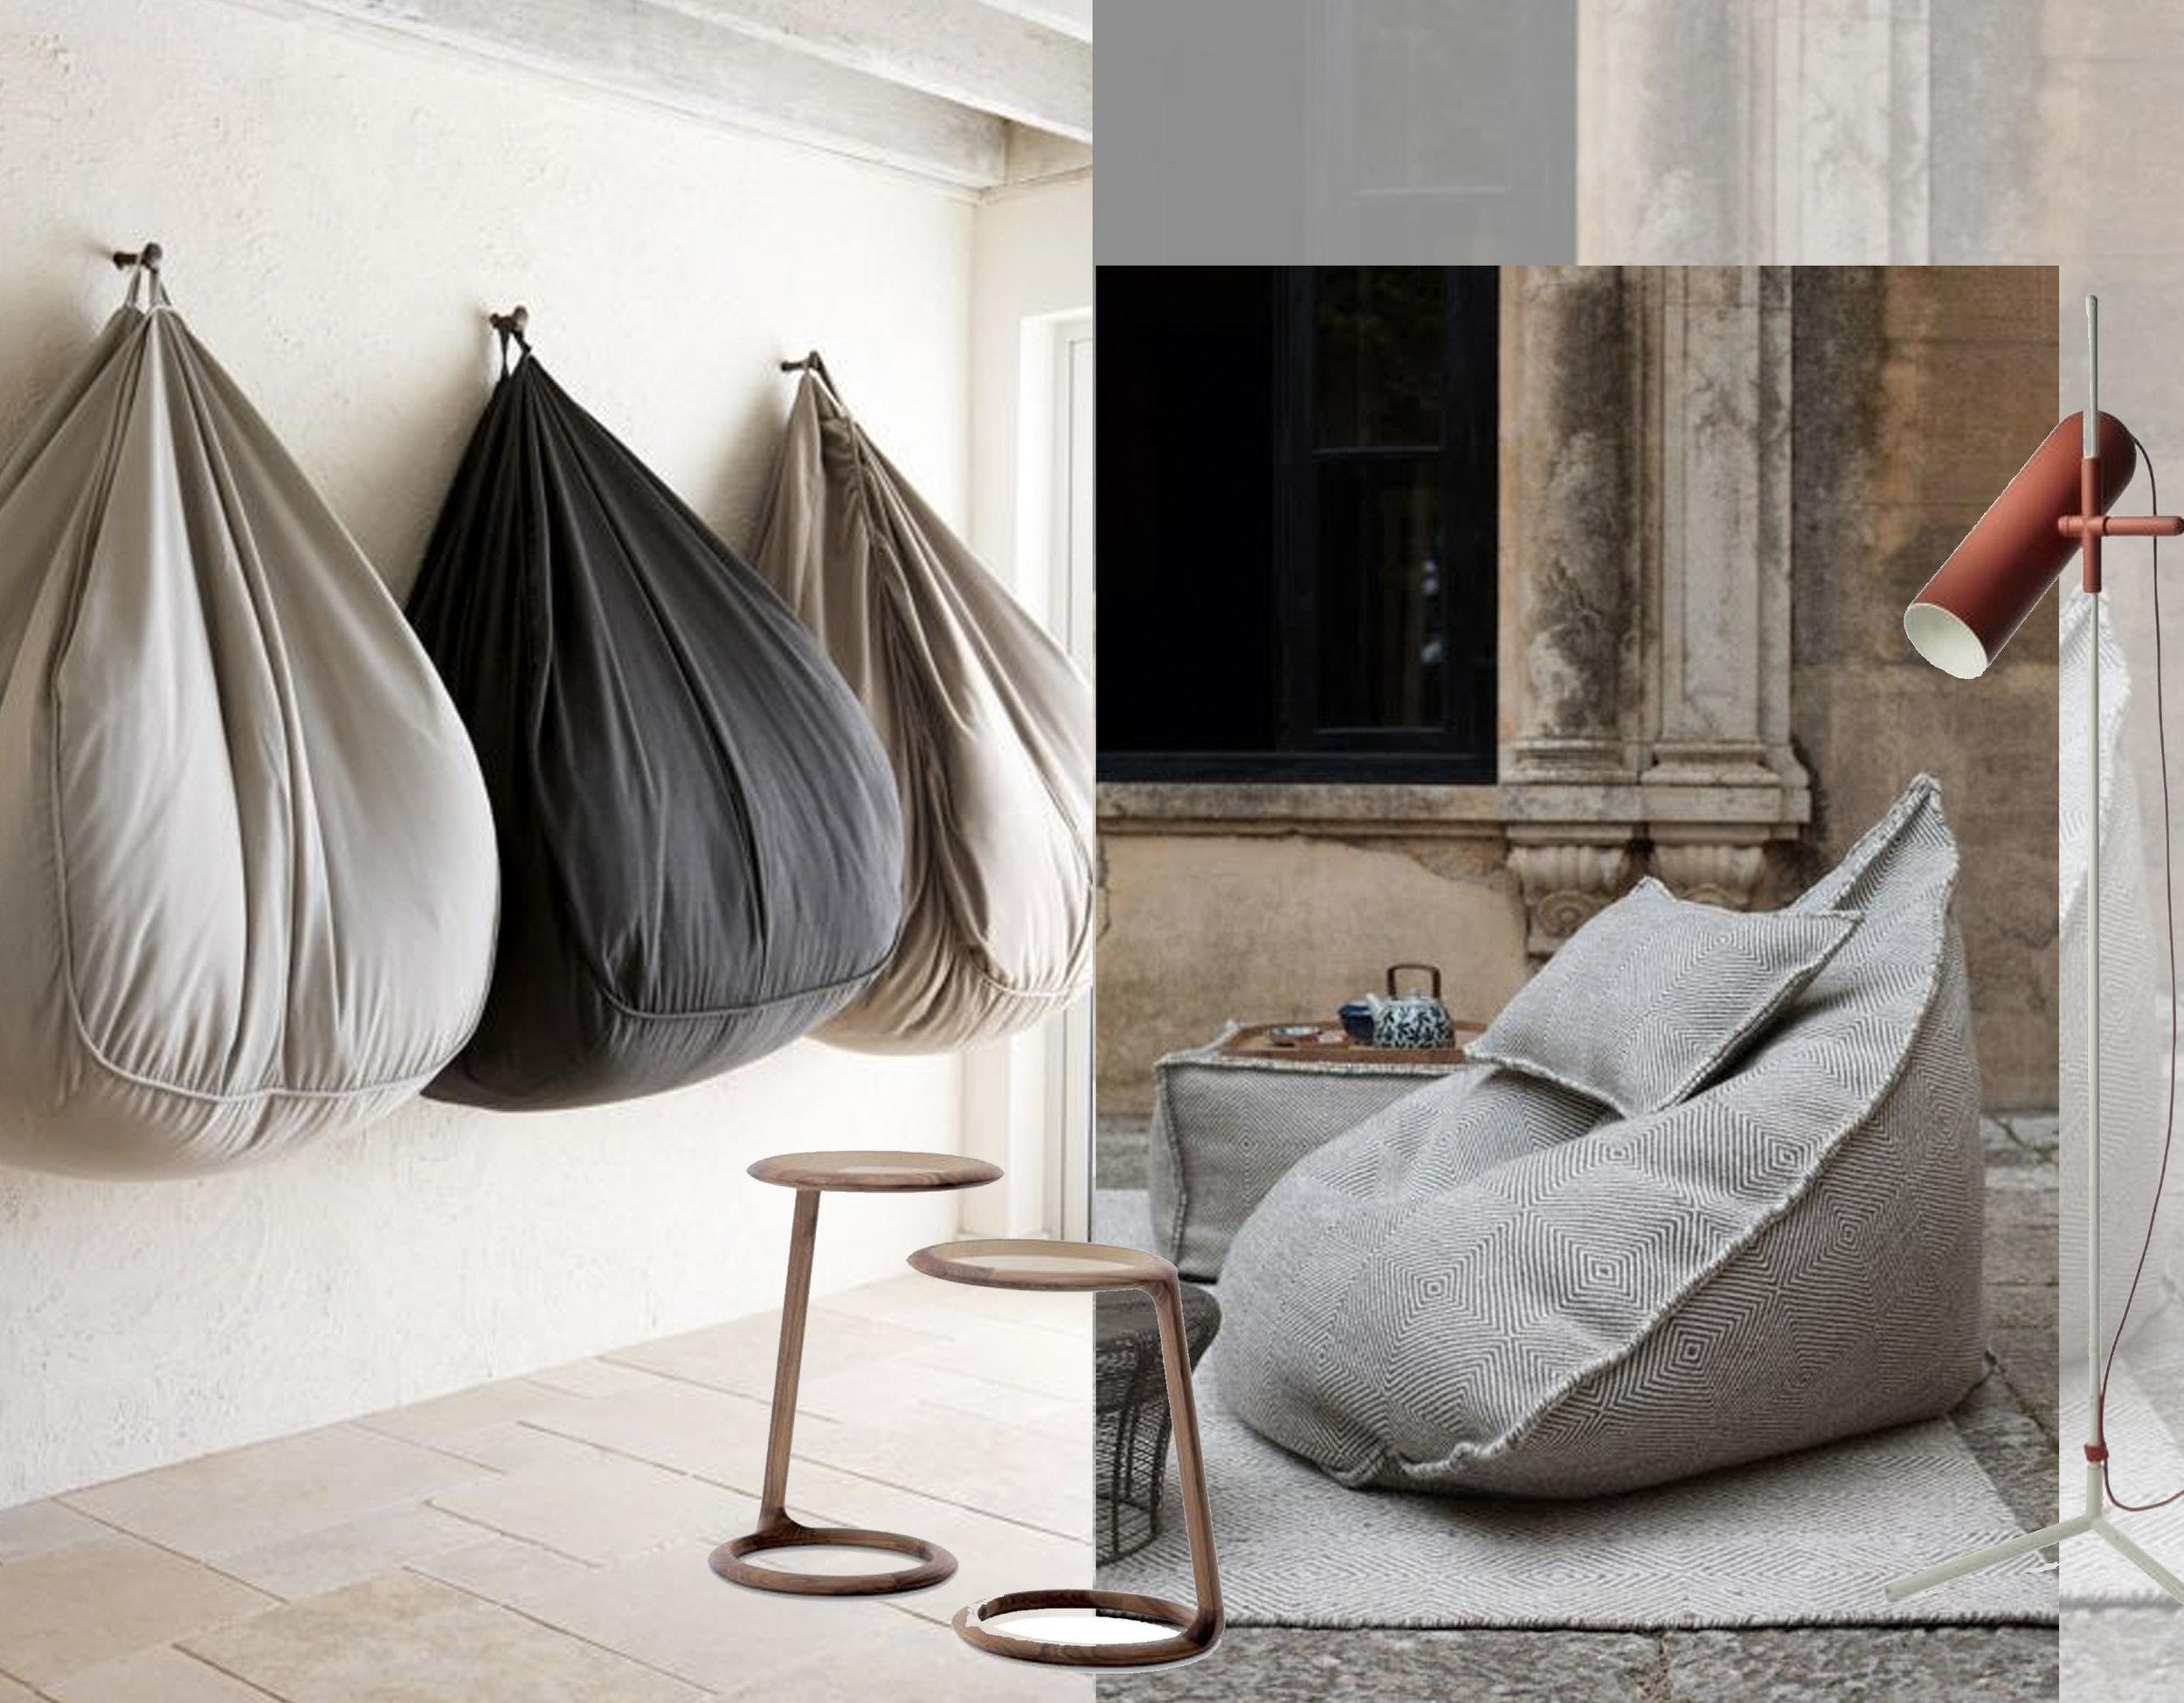 bean bags via  Interior Crisp  - Wander Floor lamp Roche Bobois via  Elle Decor  - Beside You table Ceccotti via  Tolgard